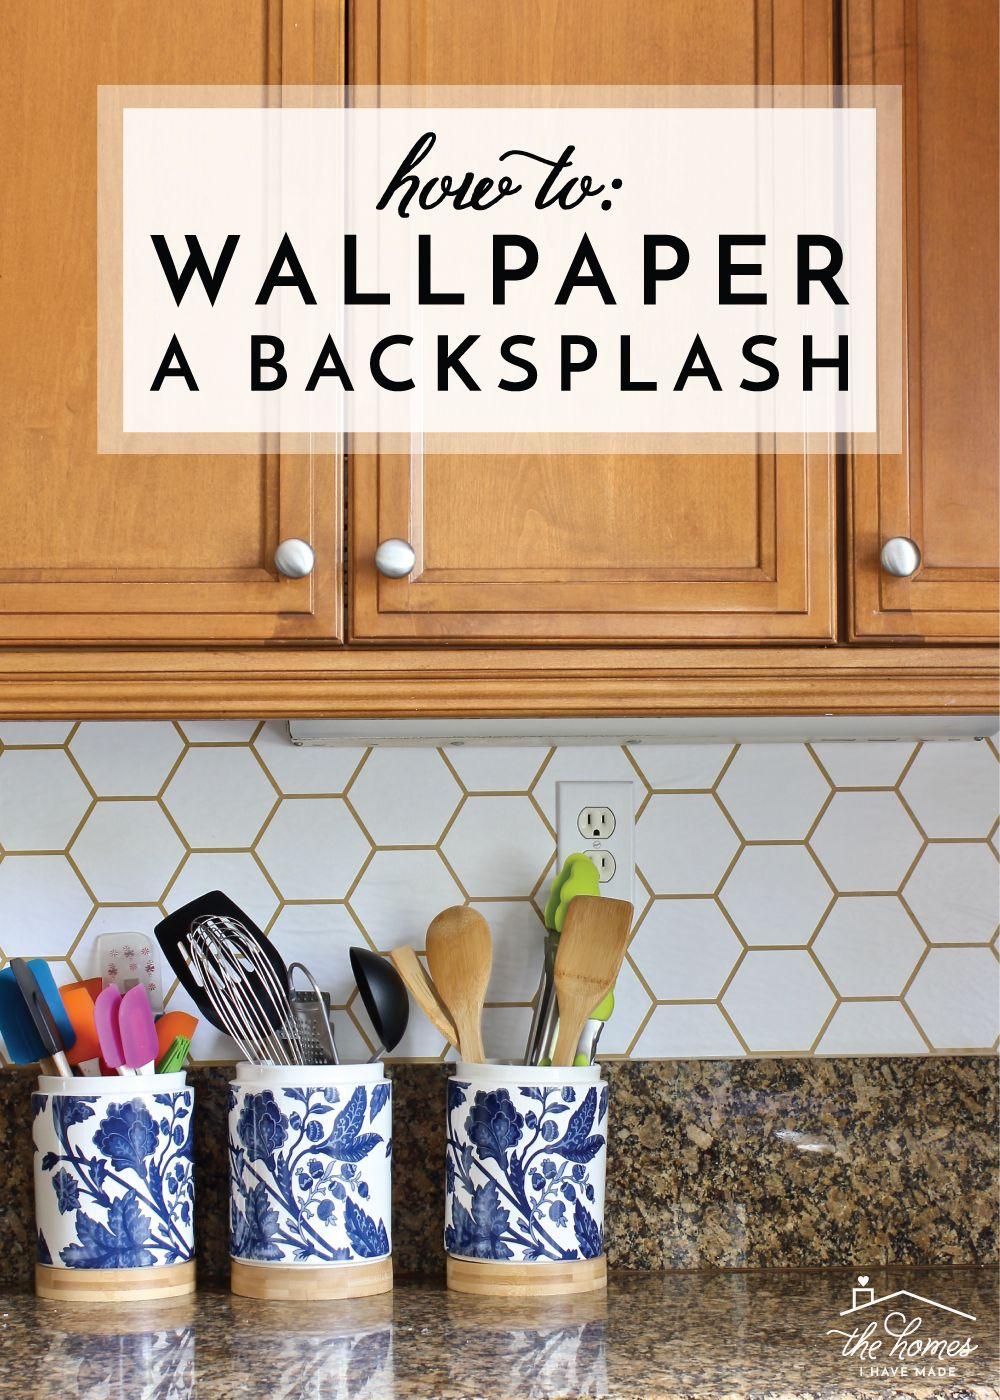 How To Wallpaper A Backsplash Wallpaper Backsplash Kitchen Kitchen Design Diy Kitchen Wallpaper